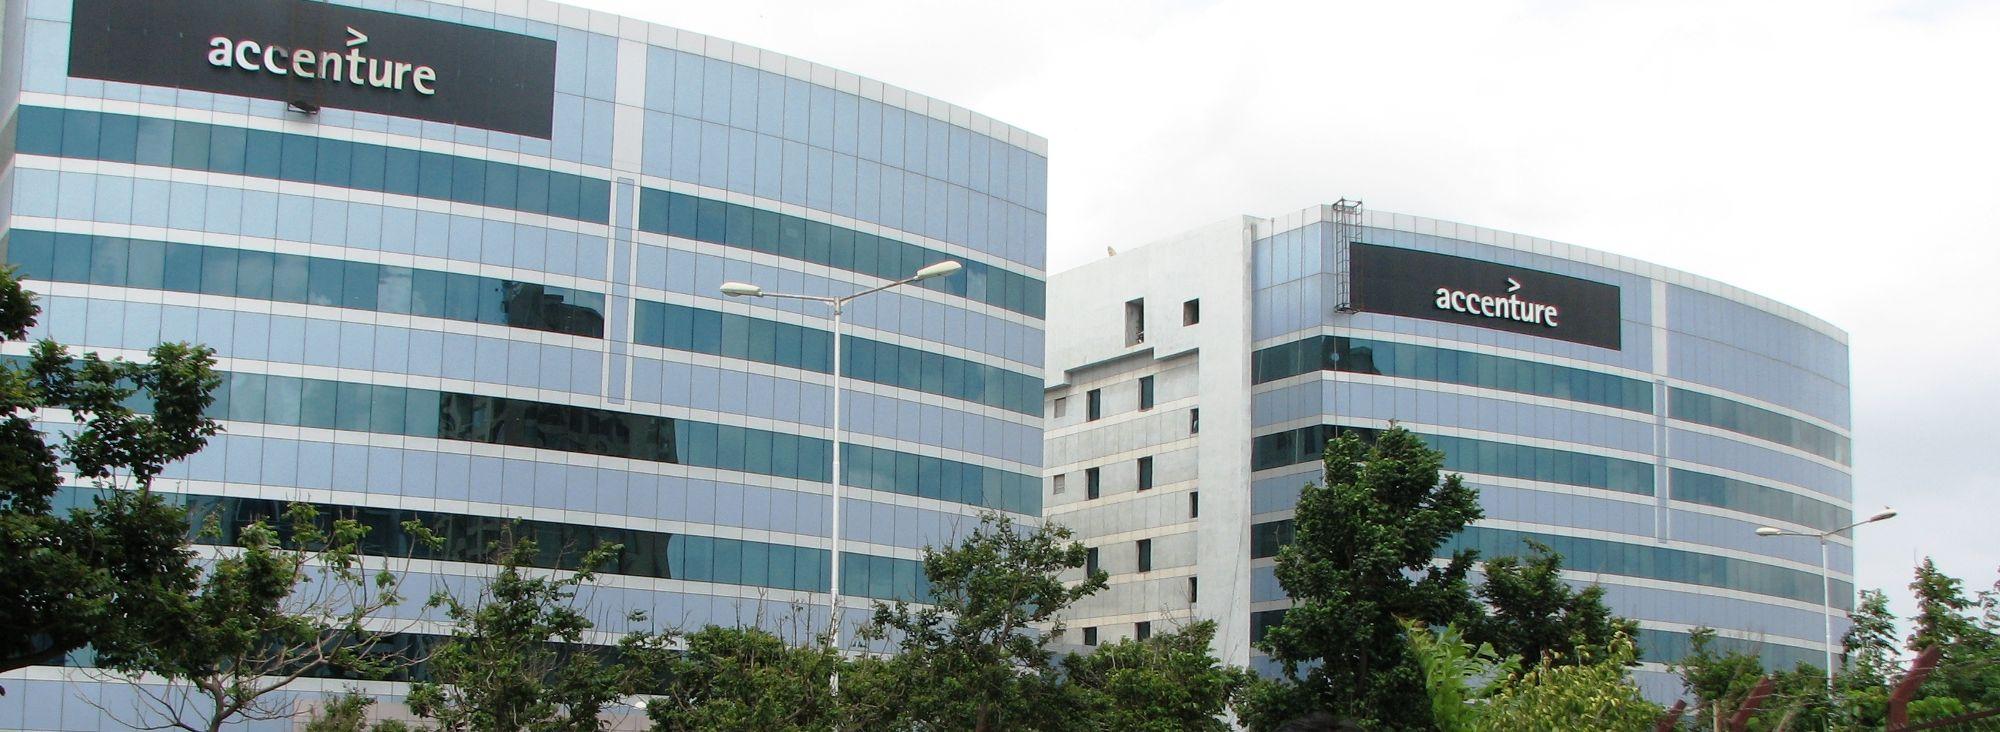 Accenture: о компании, условиях найма, тестах и собеседовании в 2020